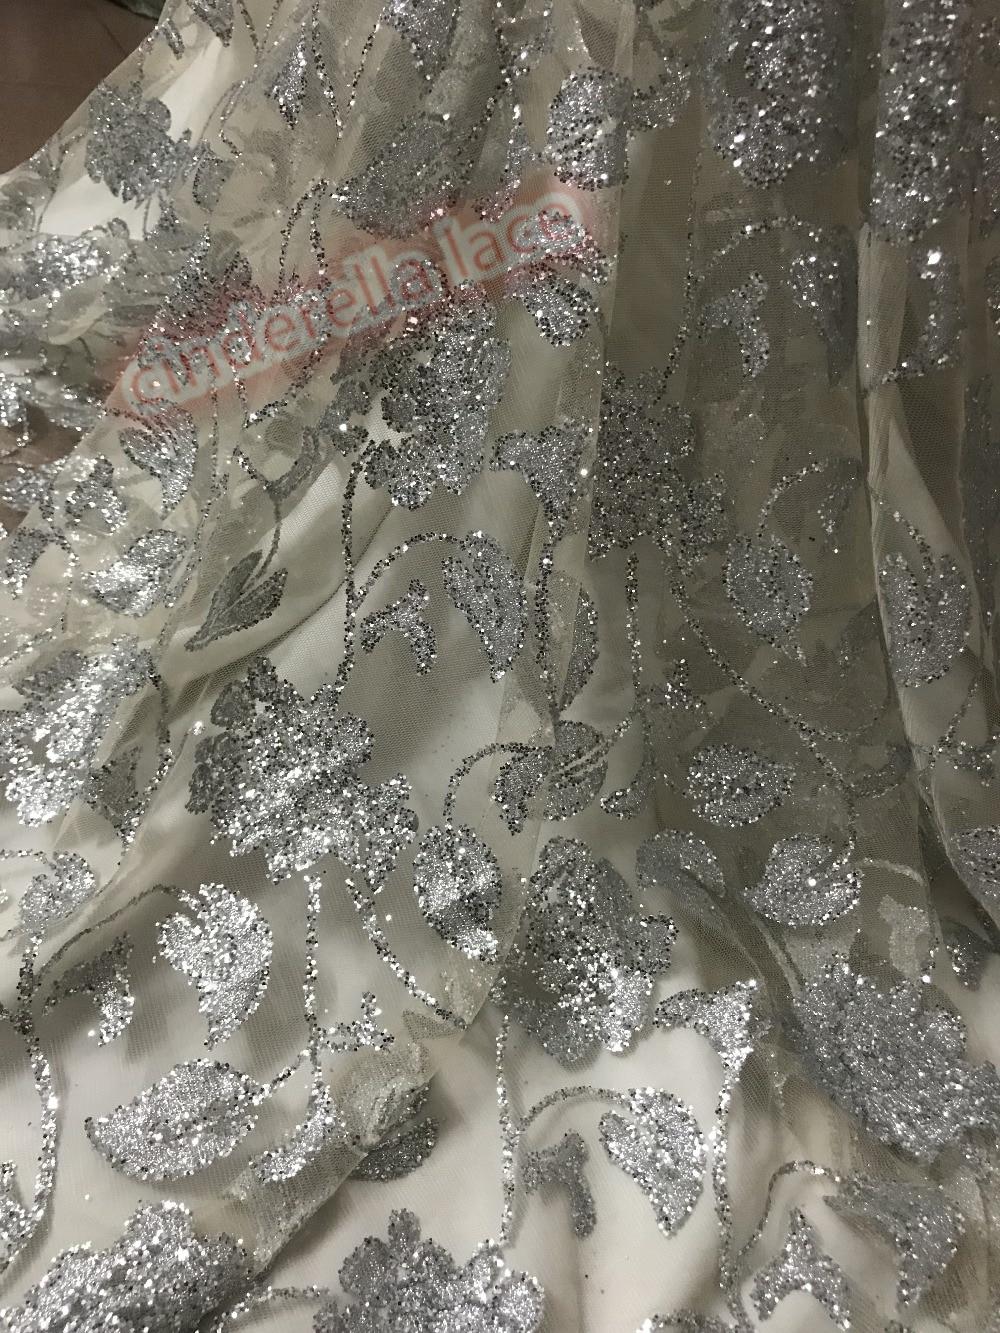 5 yards unieke glitter gelijmd sparkle tulle mesh kant stof JIANXI.C 51114 voor avondjurk/modeshow-in Kant van Huis & Tuin op  Groep 1